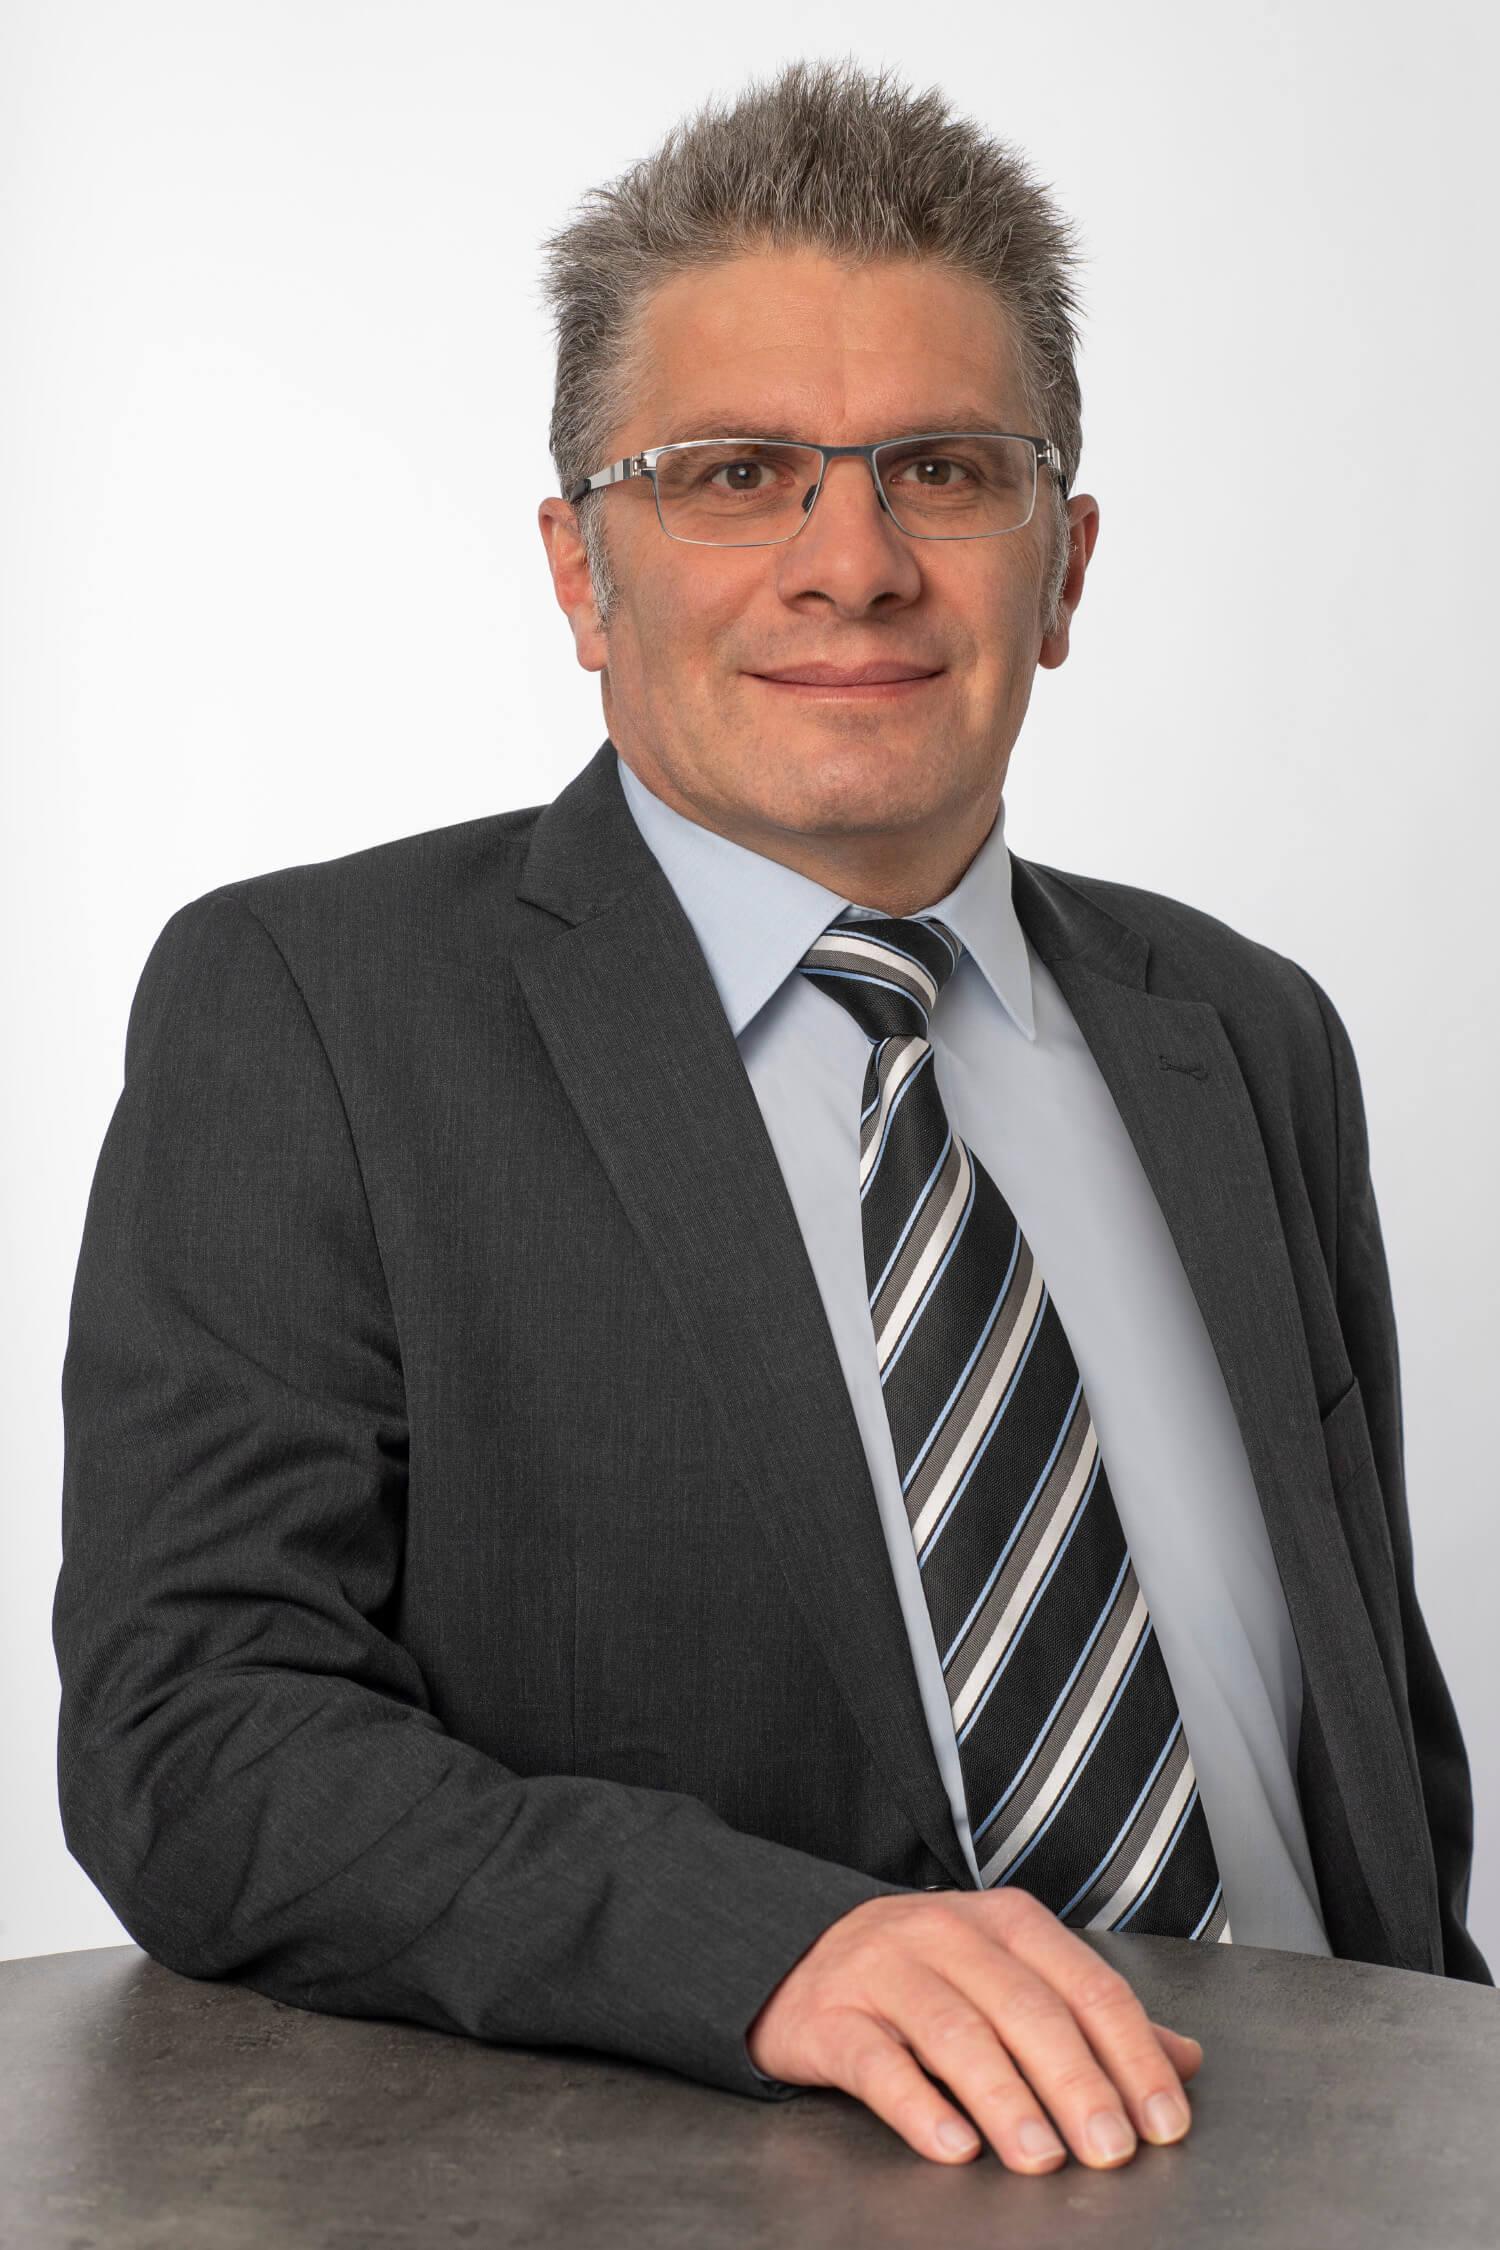 Jacques-Henri Diserens